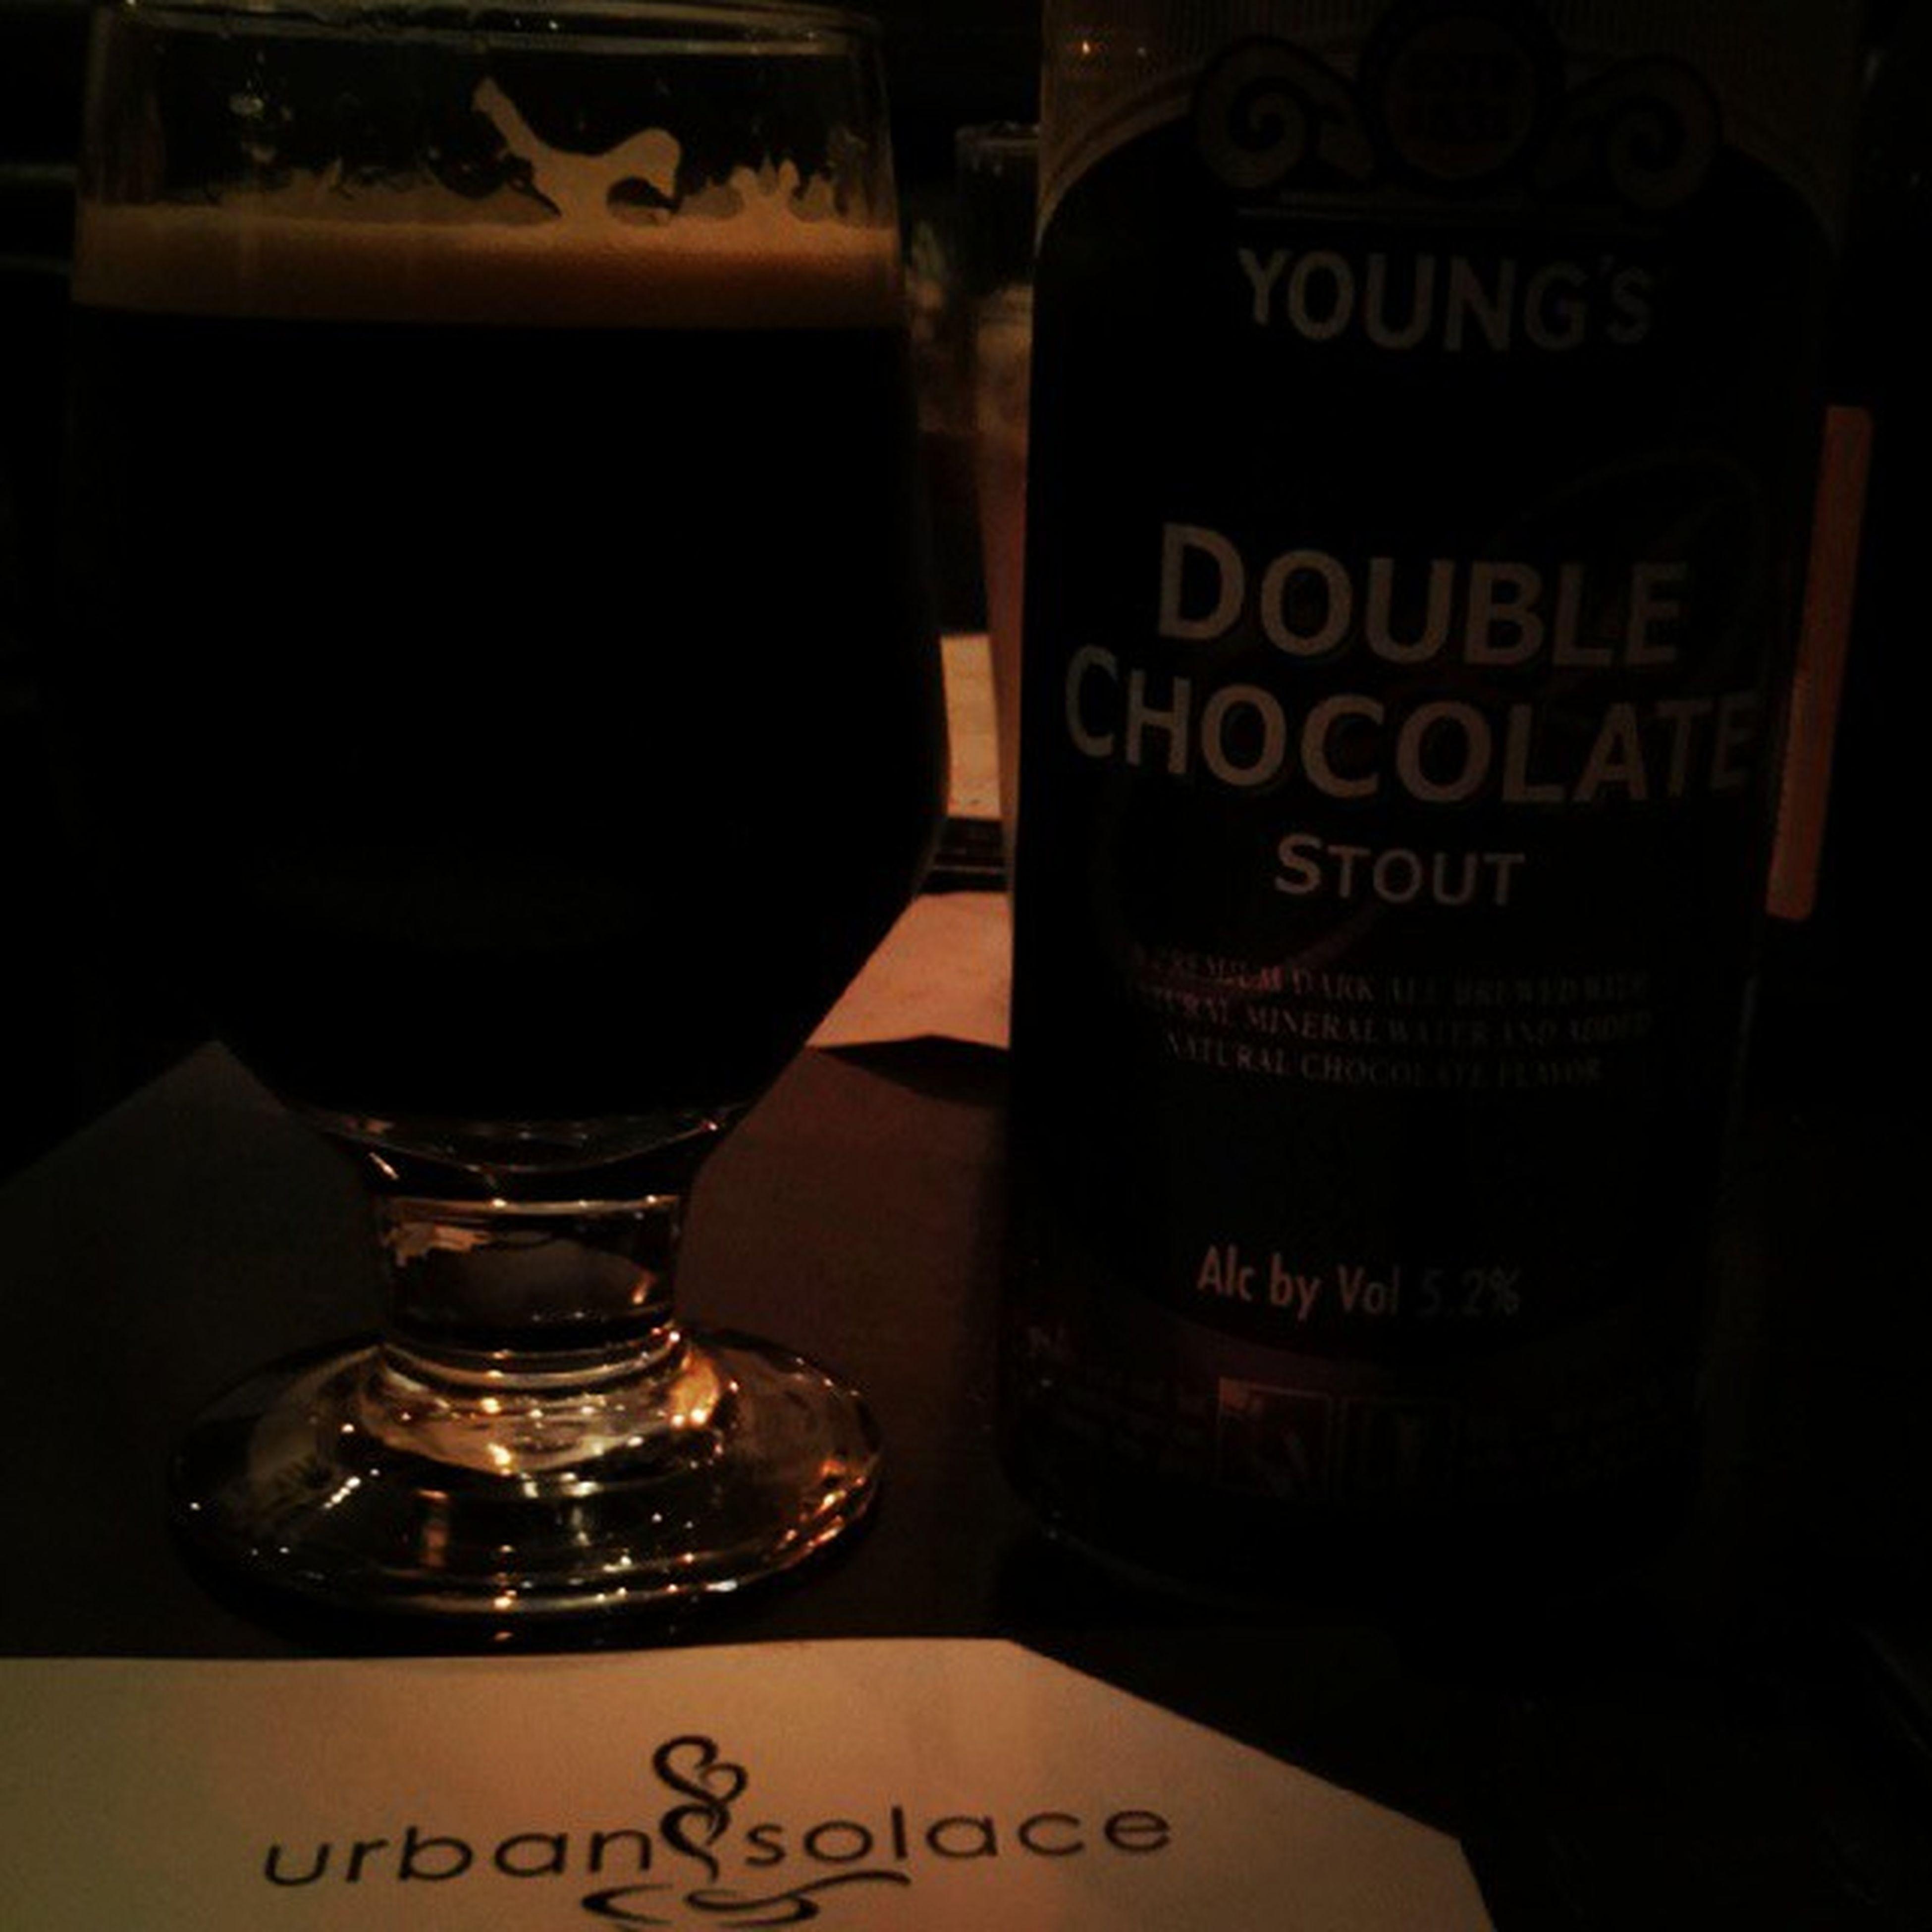 Keepin' it classy. Urbansolace Eating Restaurant Offwork beer chocolatestout sandiego california northpark